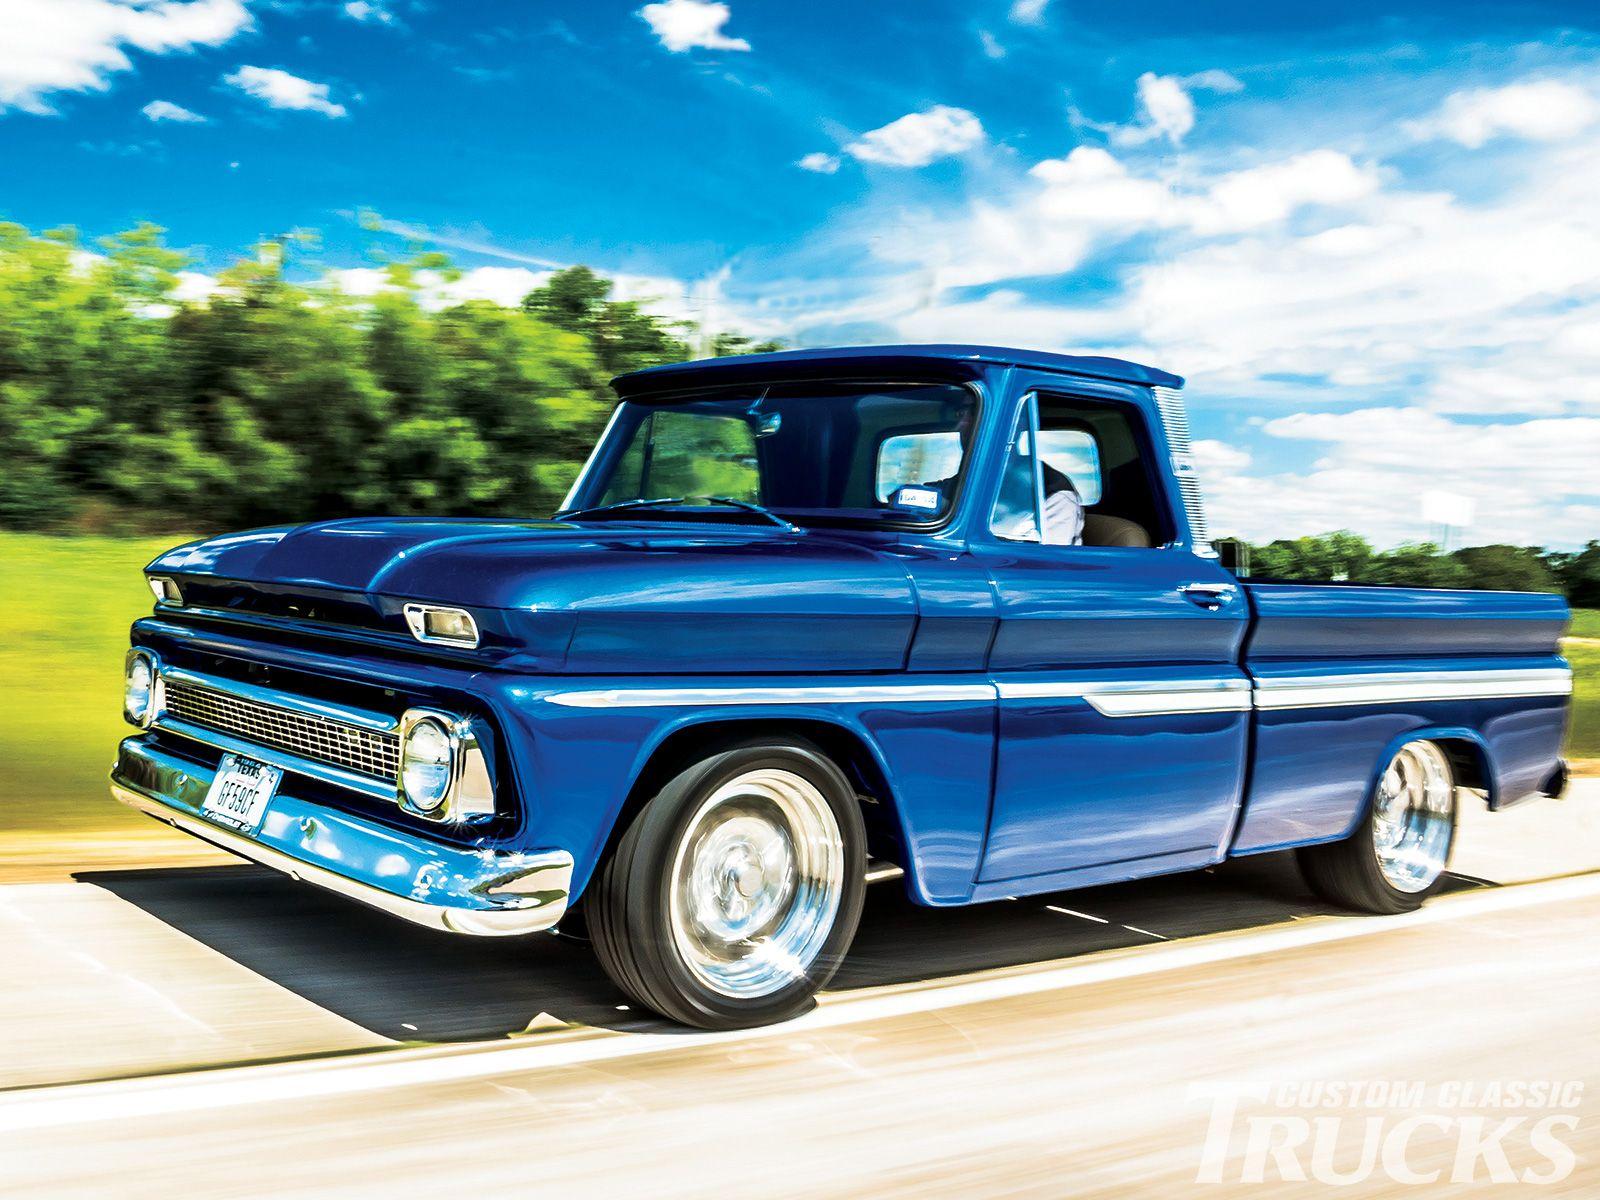 1964 Chevy C10 True Blue Companion Custom Classic Trucks